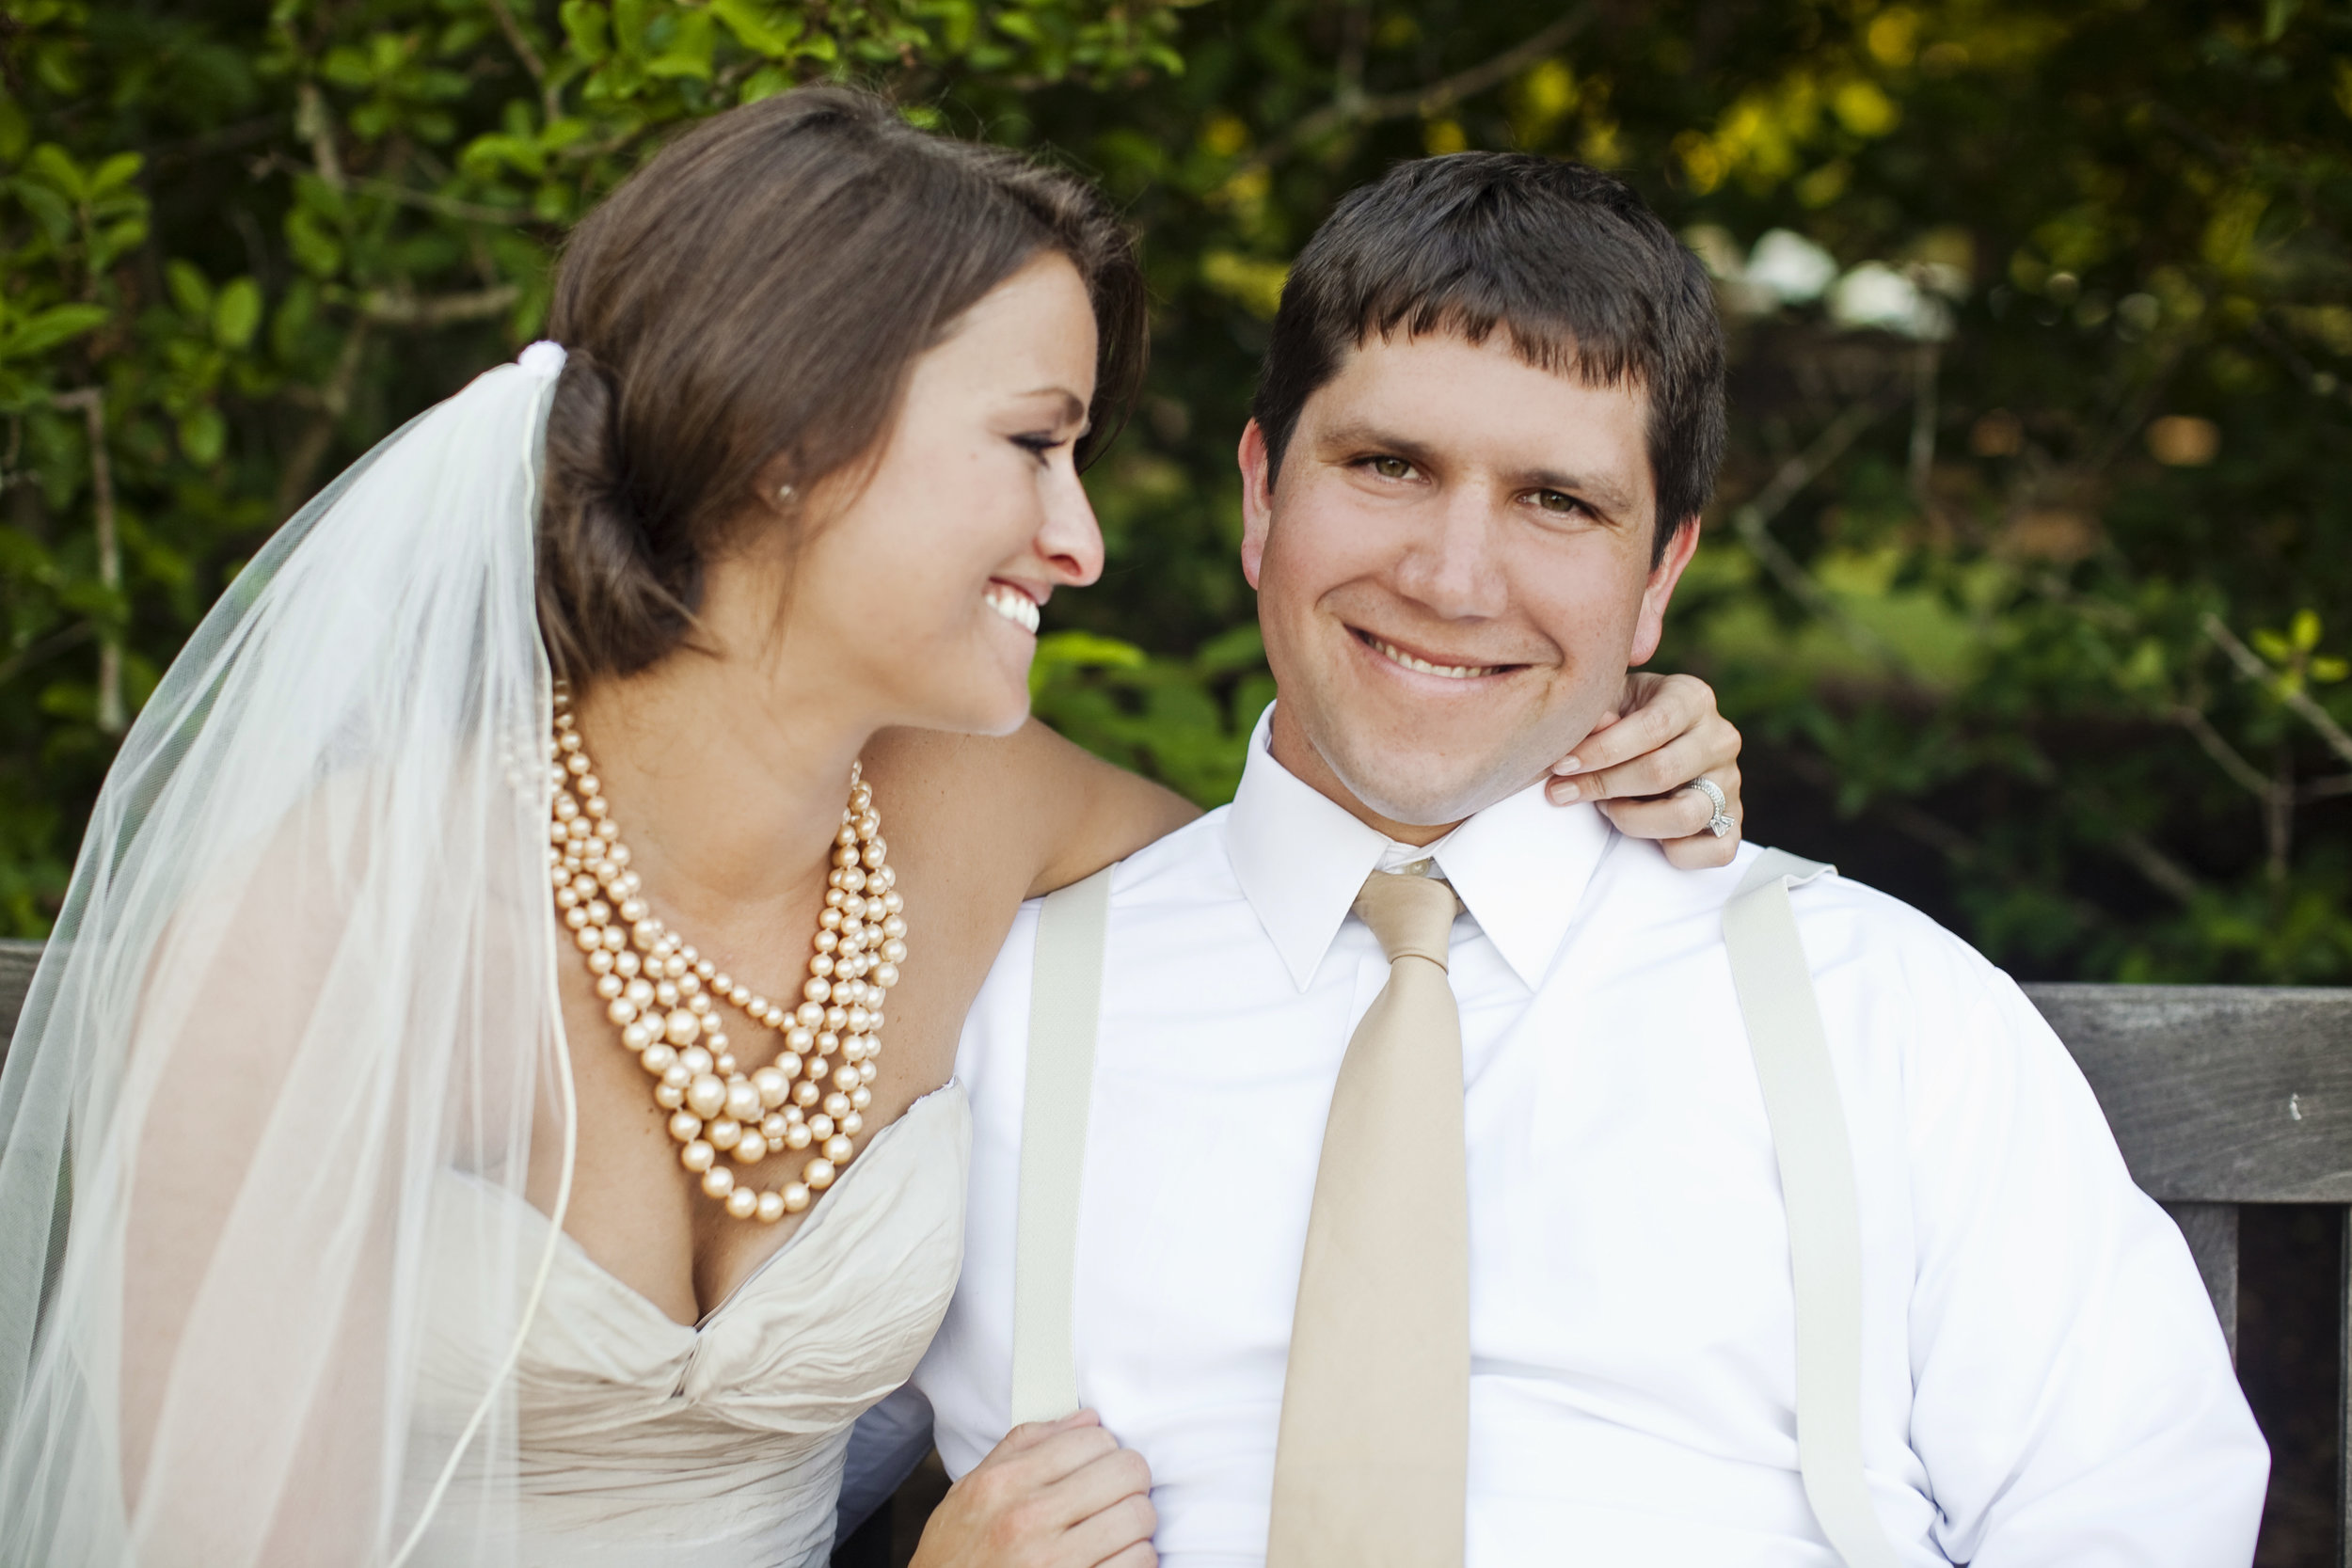 bride and groom / heirloomed